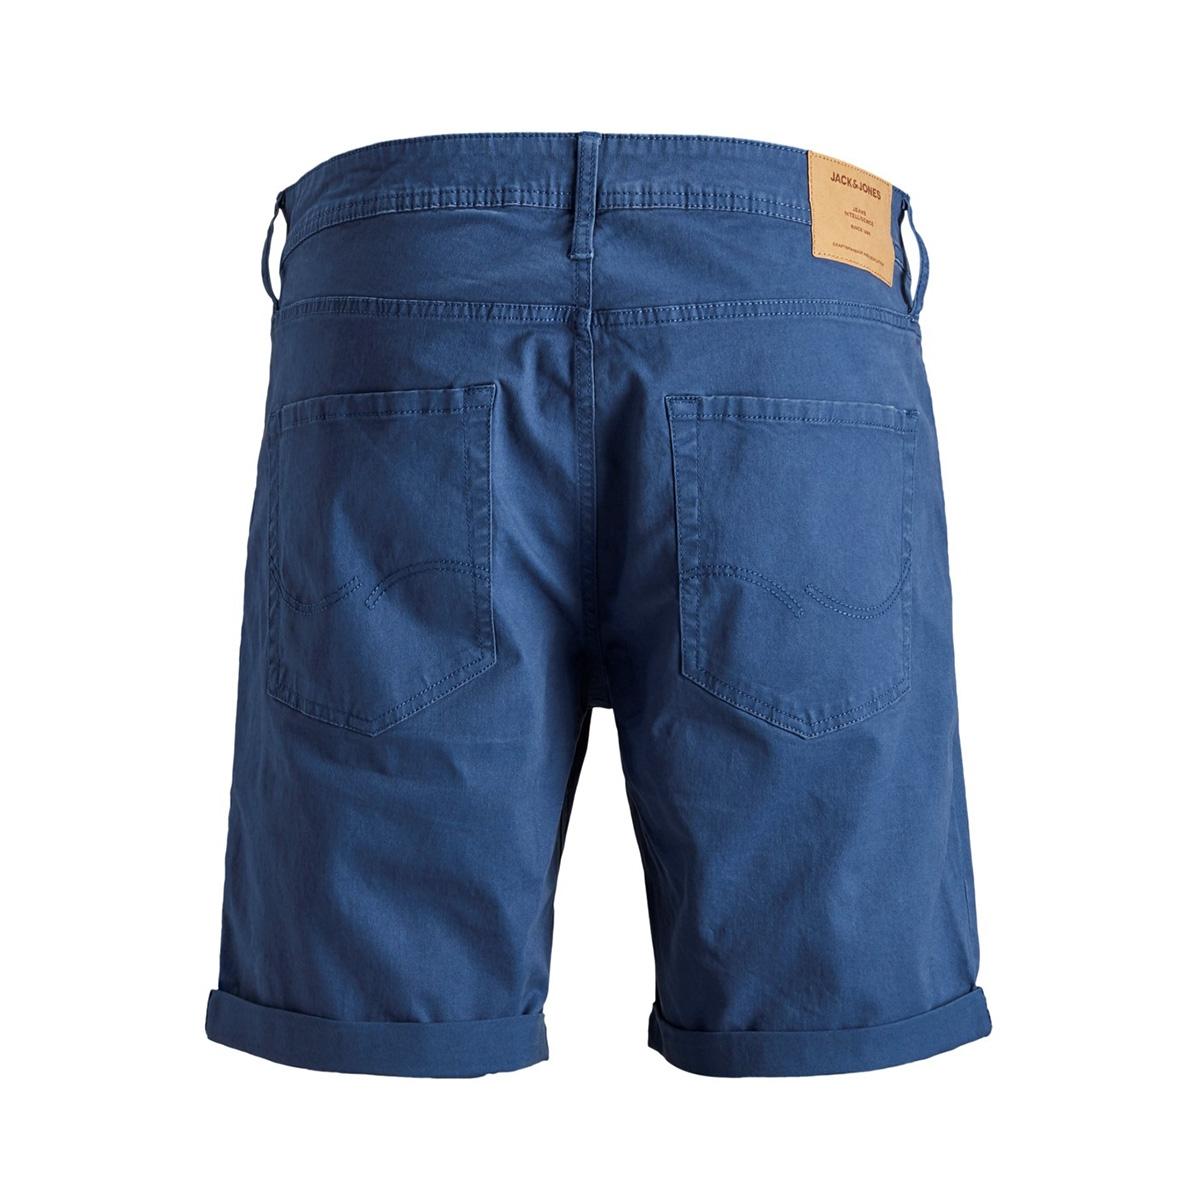 jjirick jjoriginal shorts ww 01 12146165 jack & jones korte broek true navy